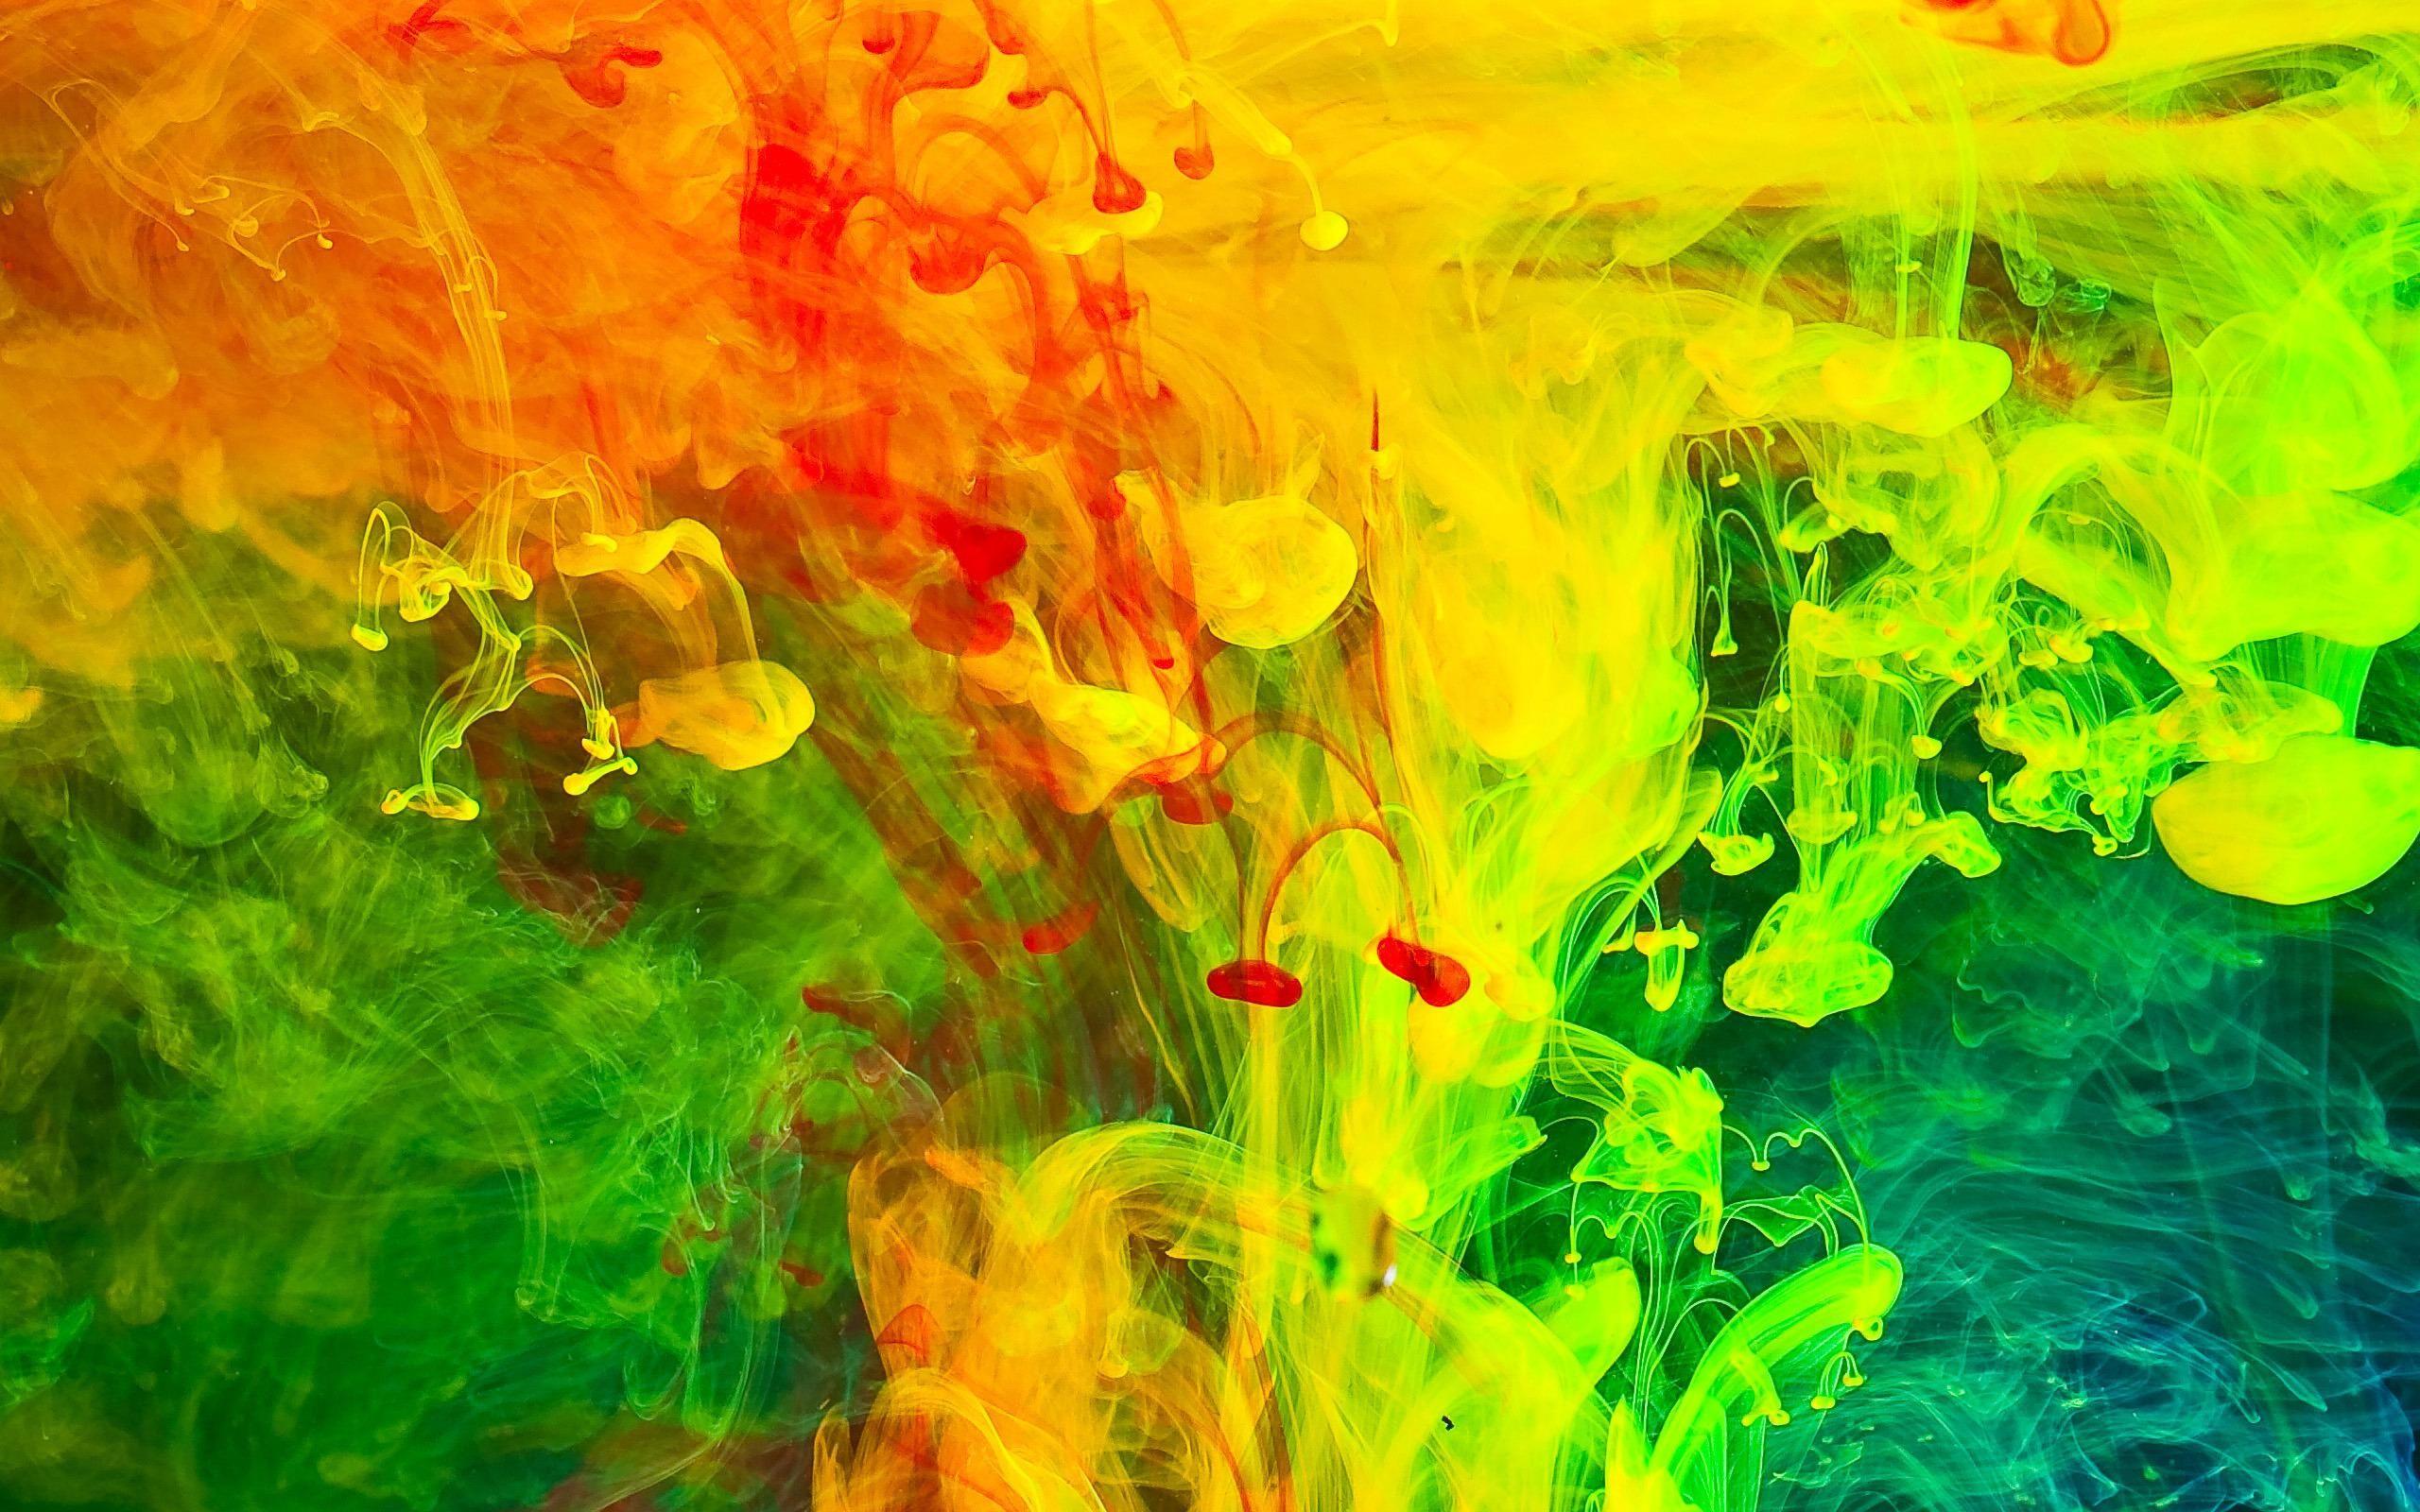 su2bvee (2560×1600) | 圖像風格一覽表 | pinterest | smoke